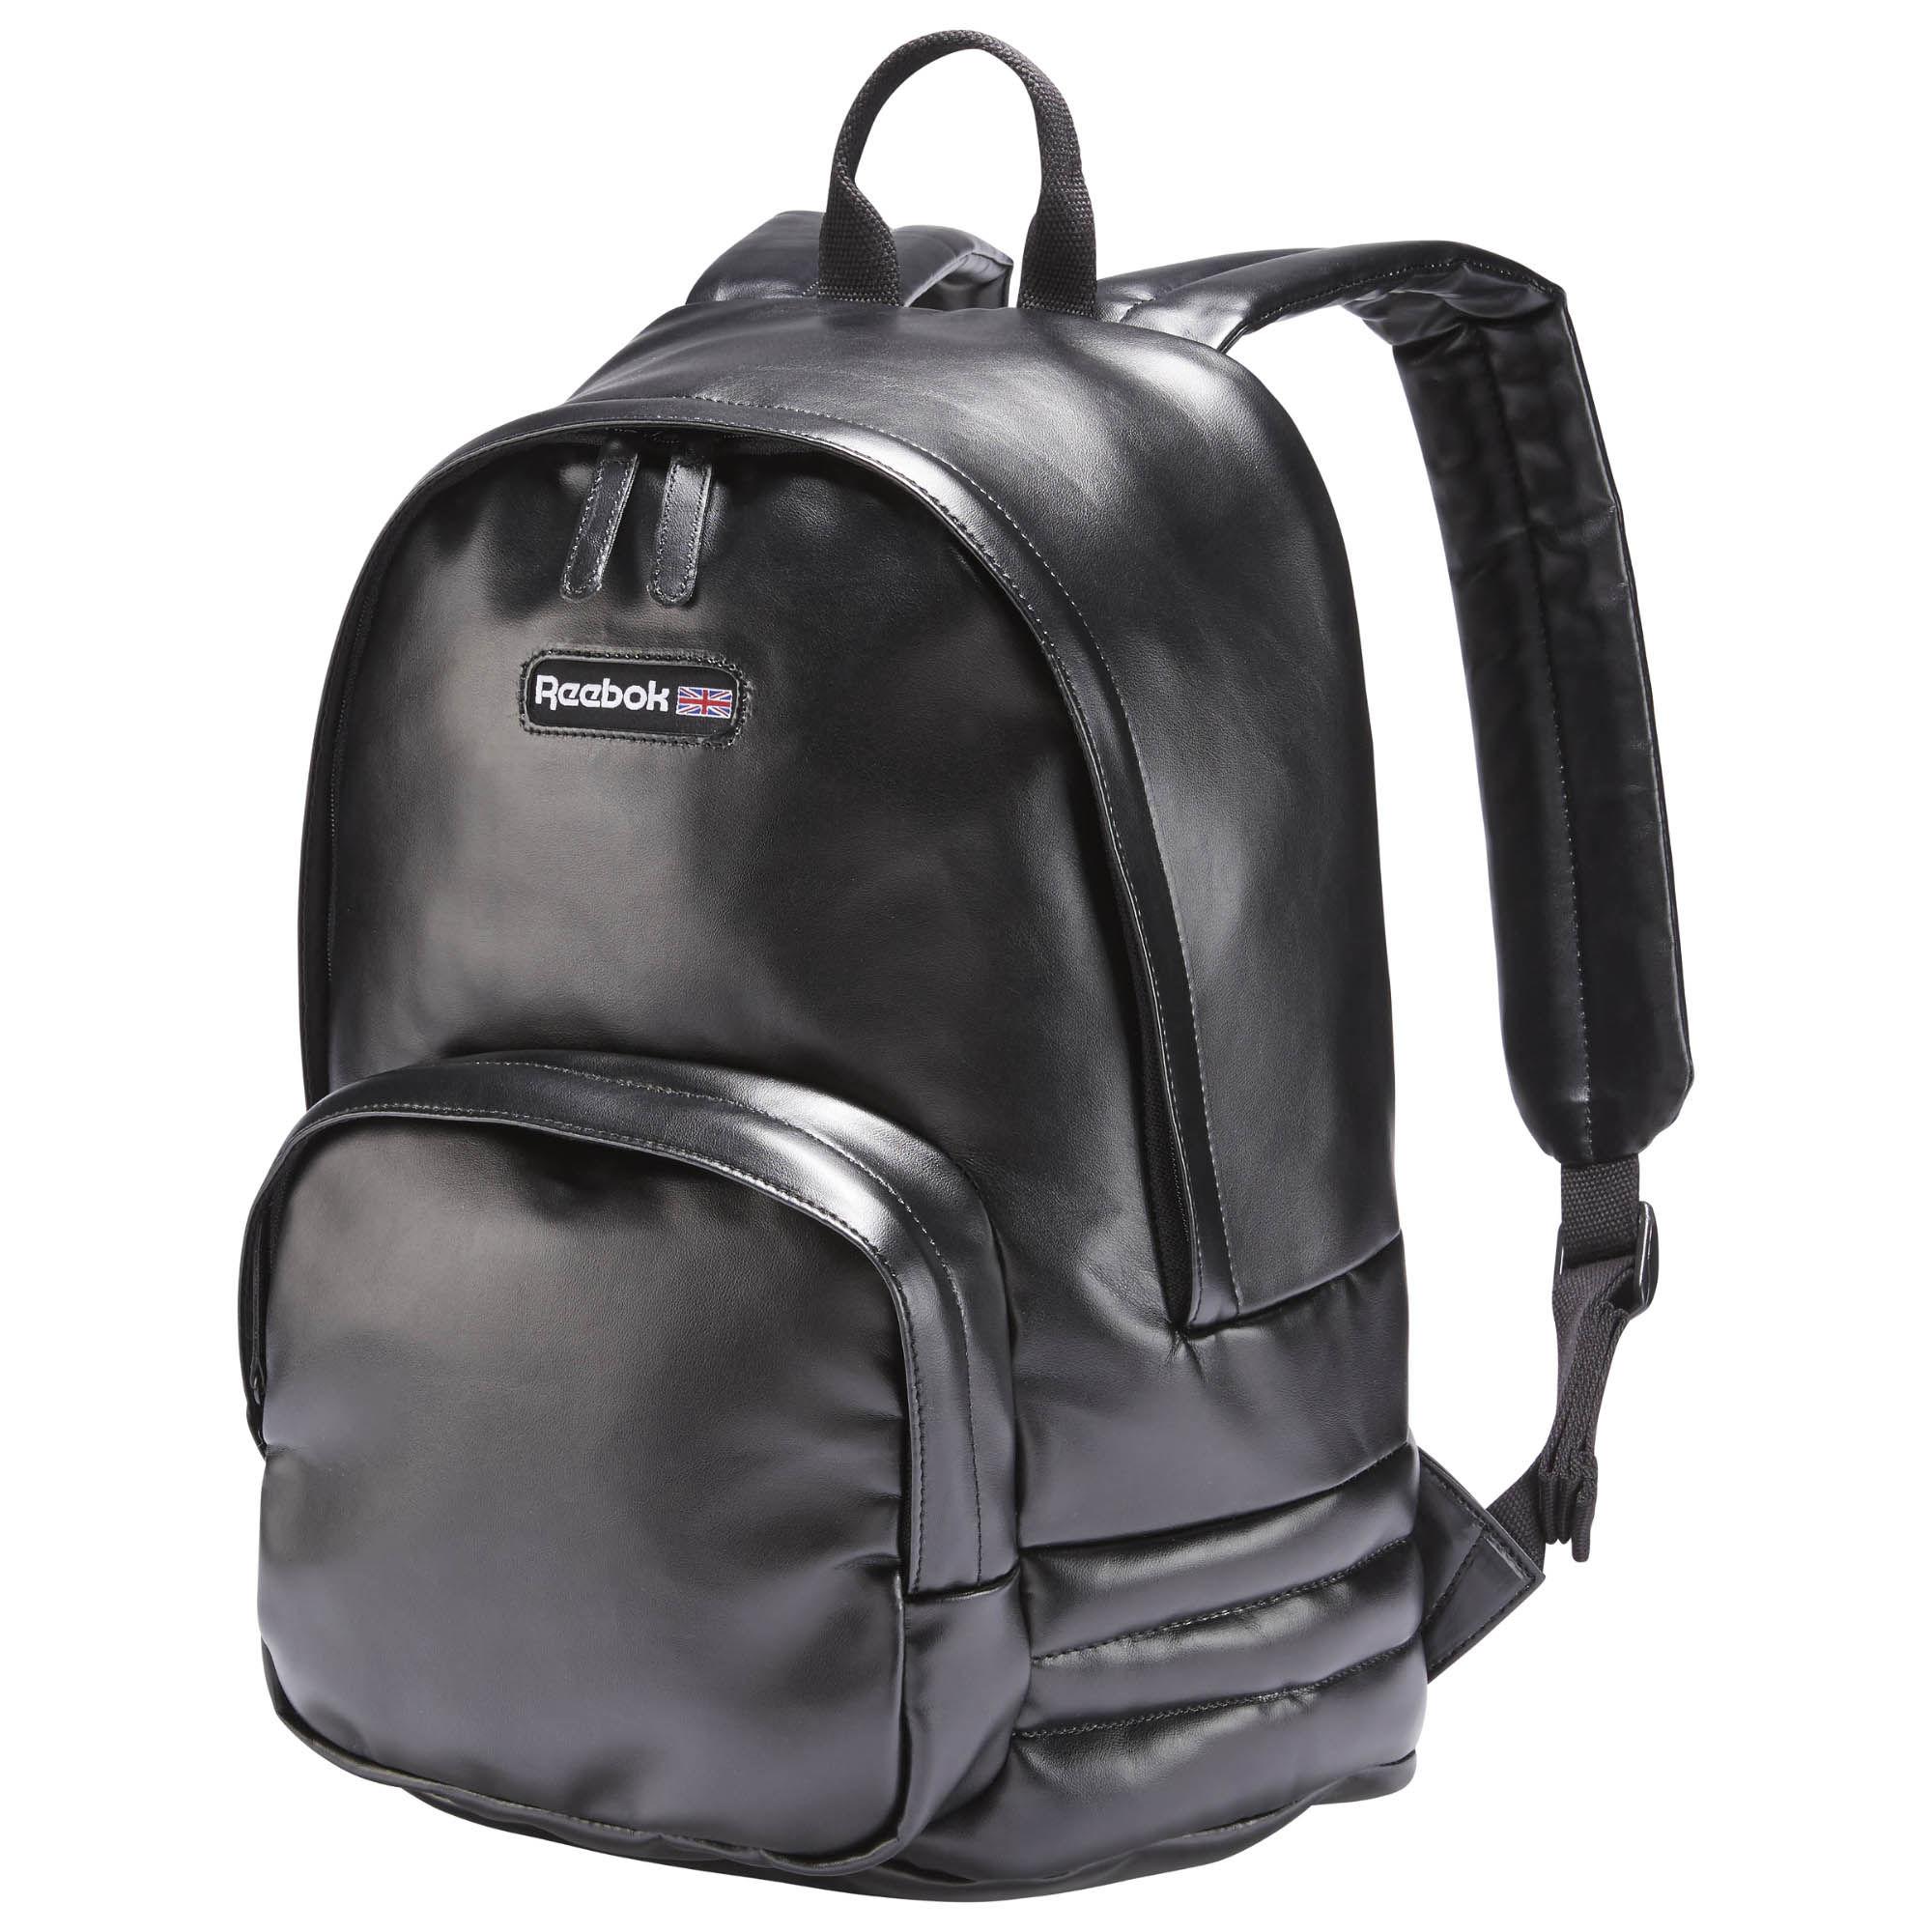 Рюкзак рибок женский купить рюкзак черный купить в нижнем новгороде